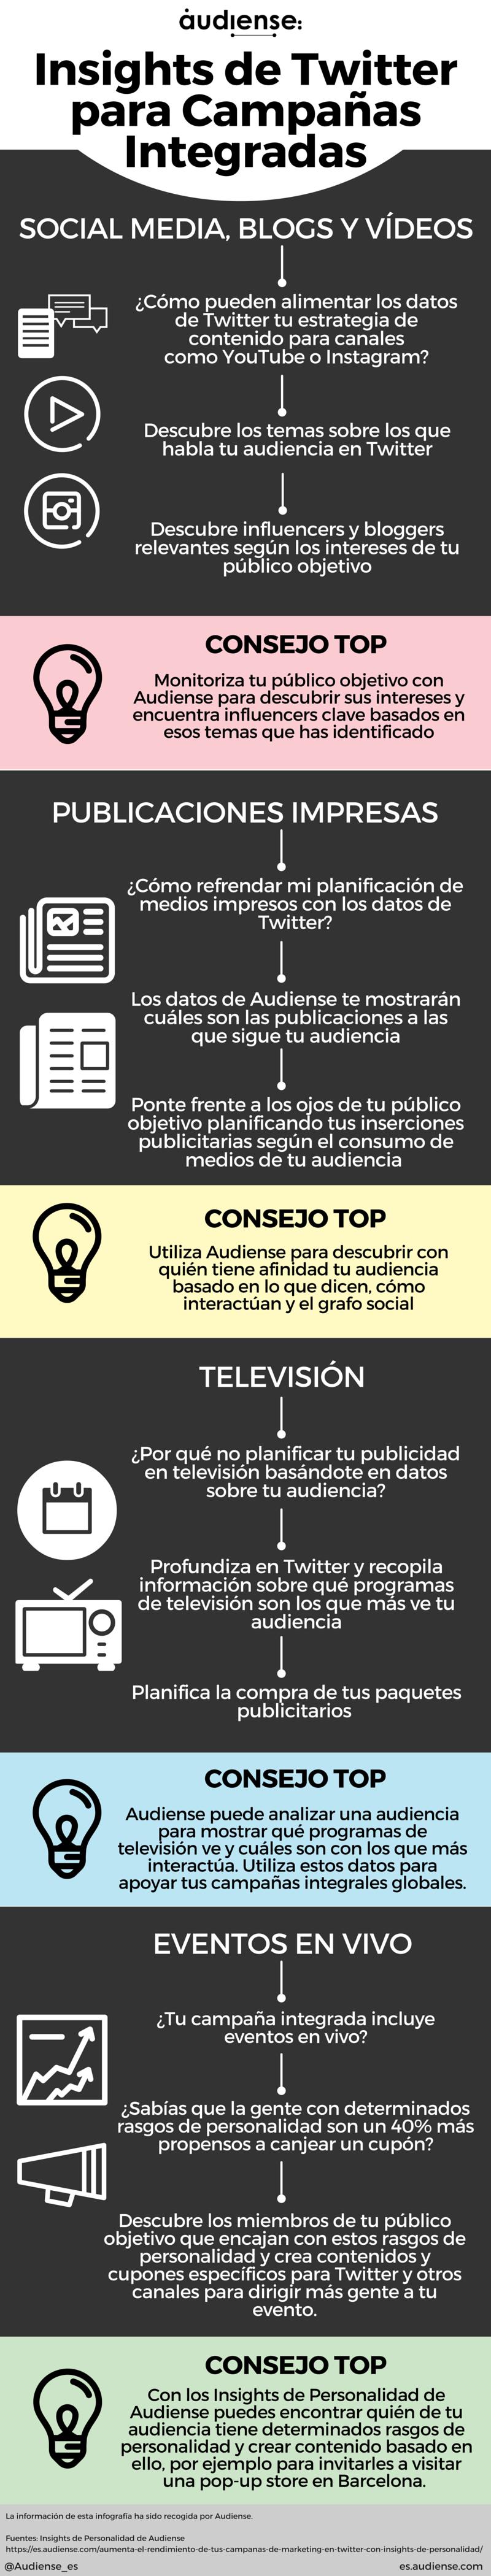 Insights de Twitter en Campañas integradas #infografia #socialmedia #marketing